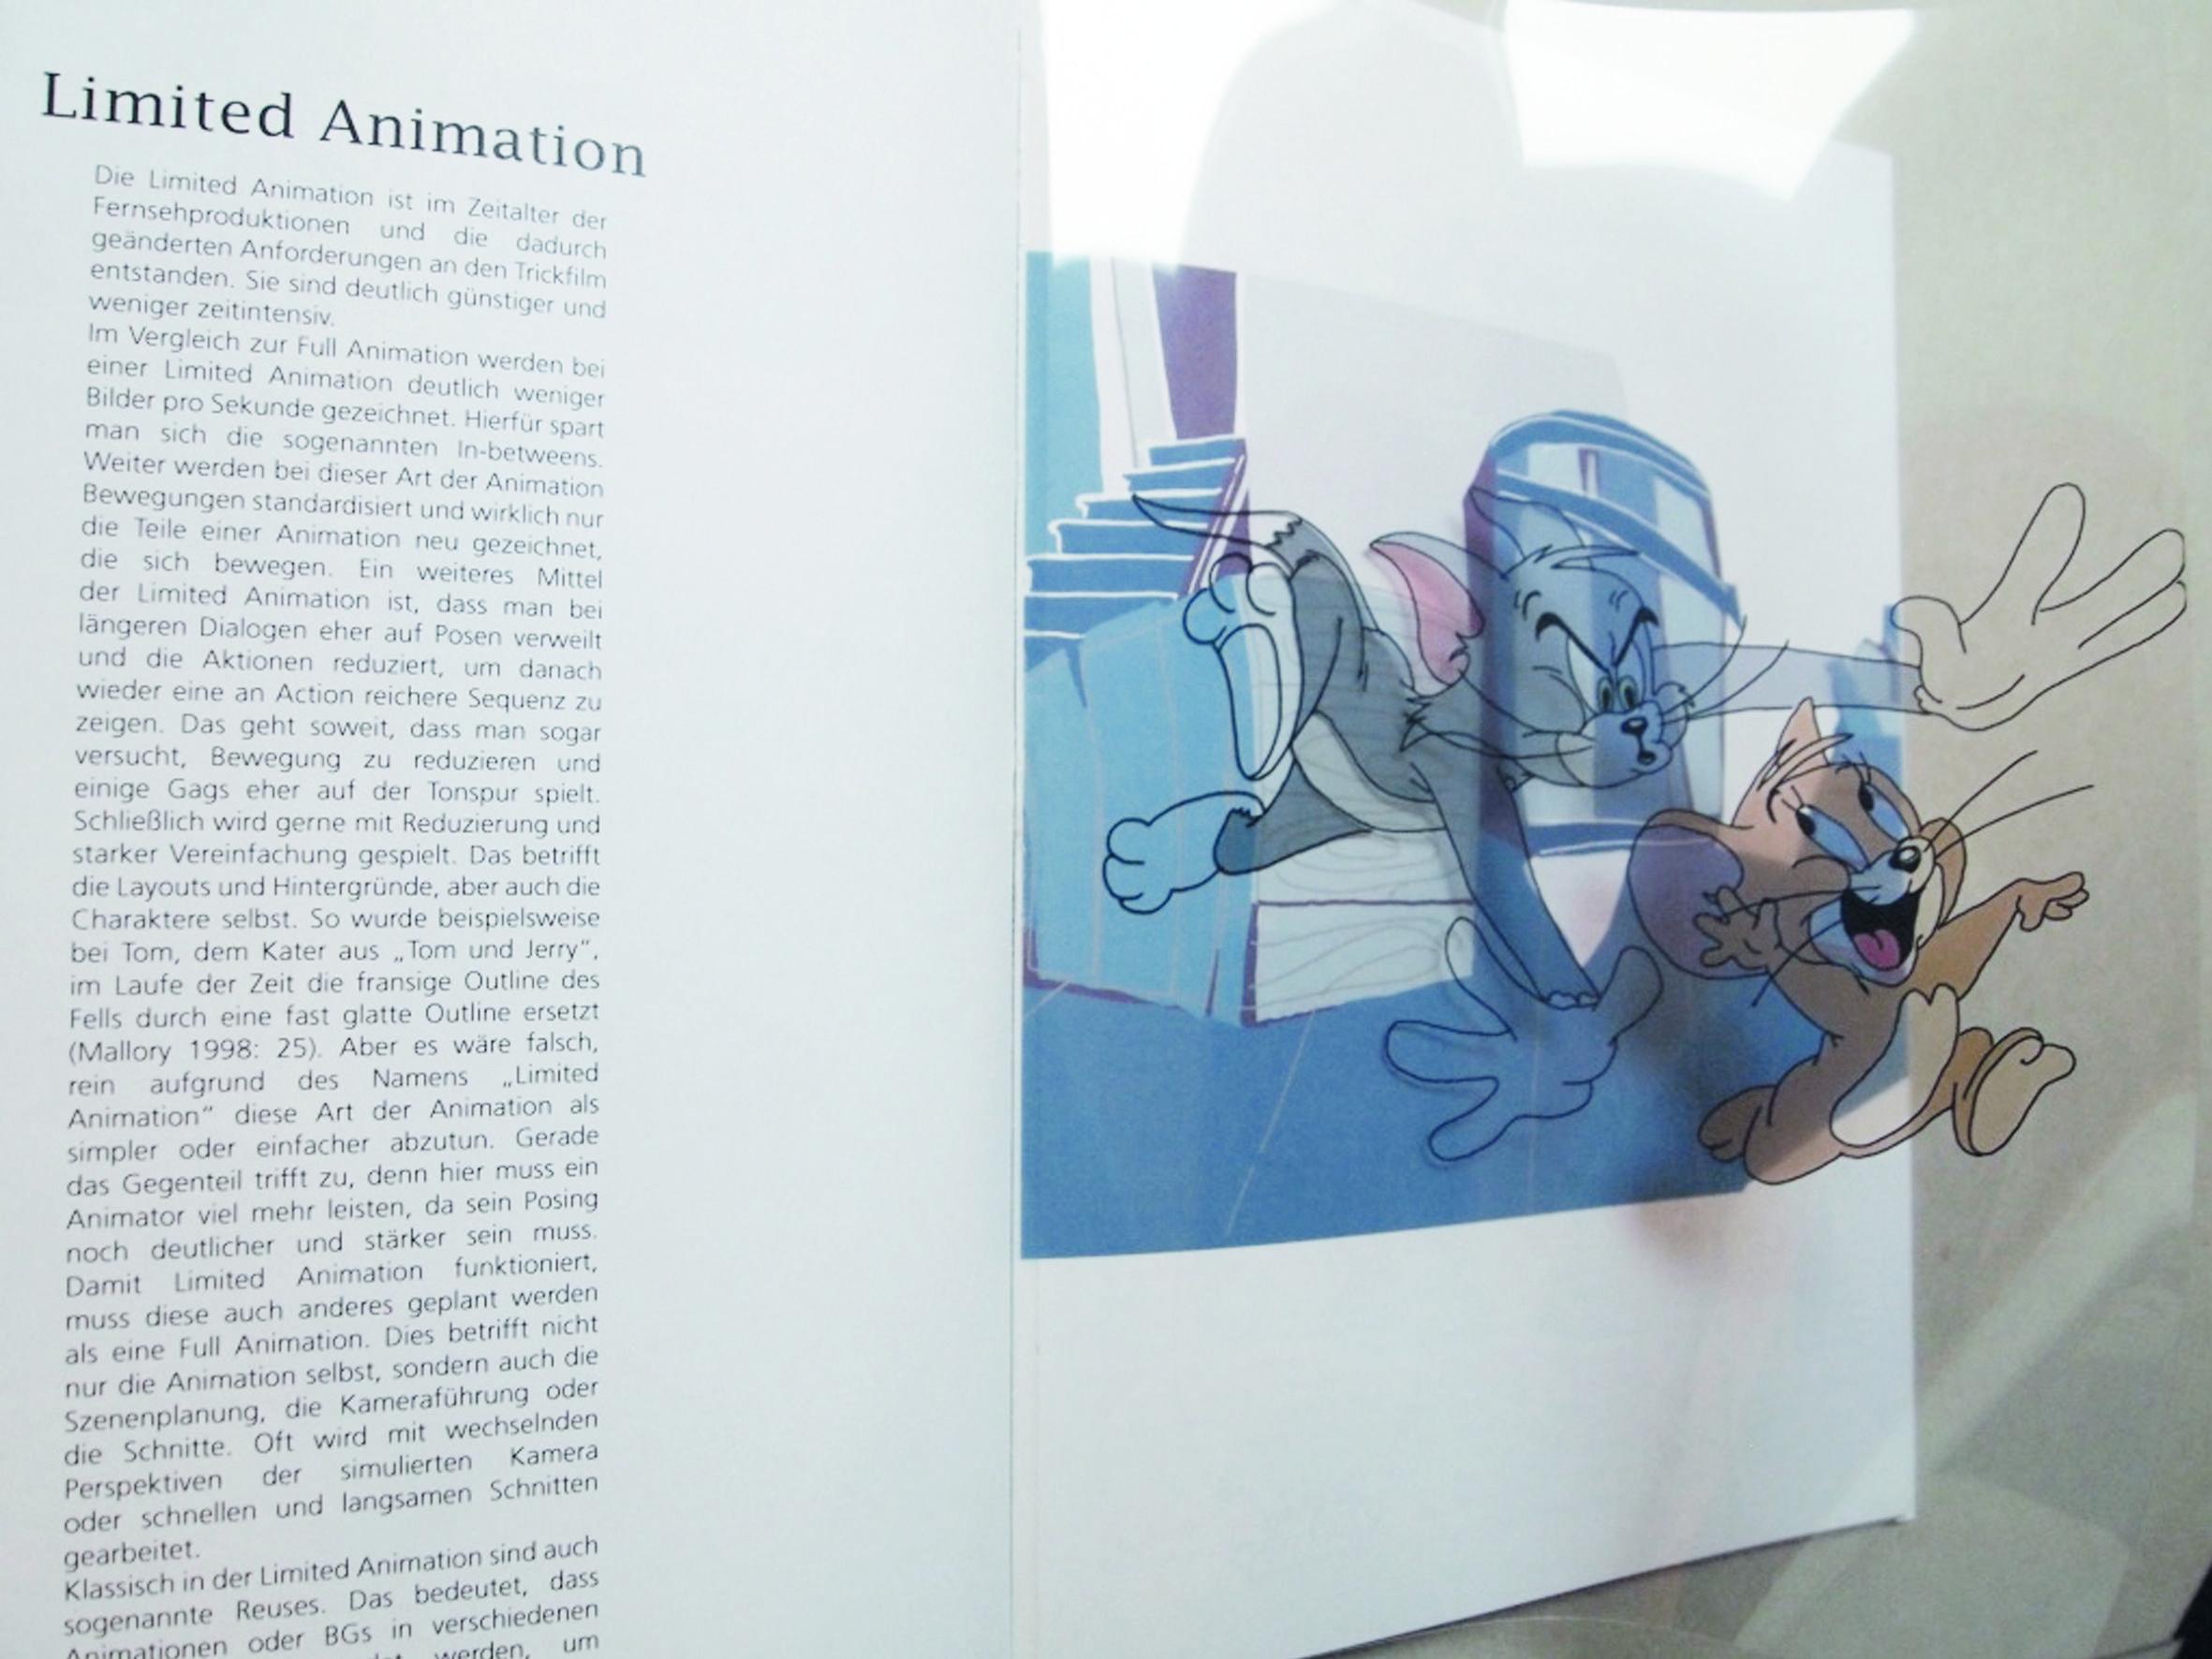 Niedlich Stop Motion Animation Frames Pro Sekunde Bilder ...